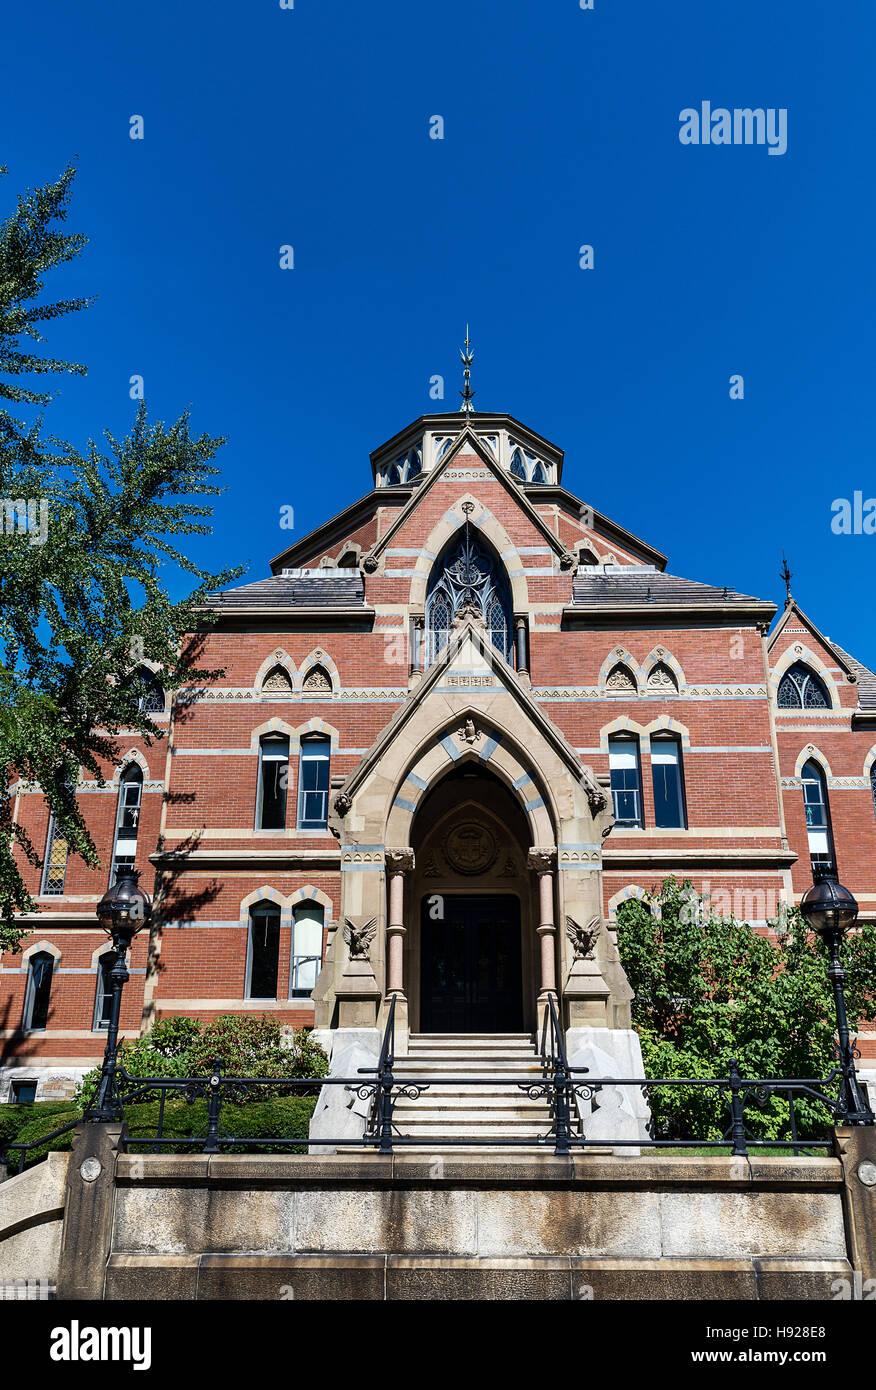 Robinson Hall Economics building on Brown University campus. - Stock Image